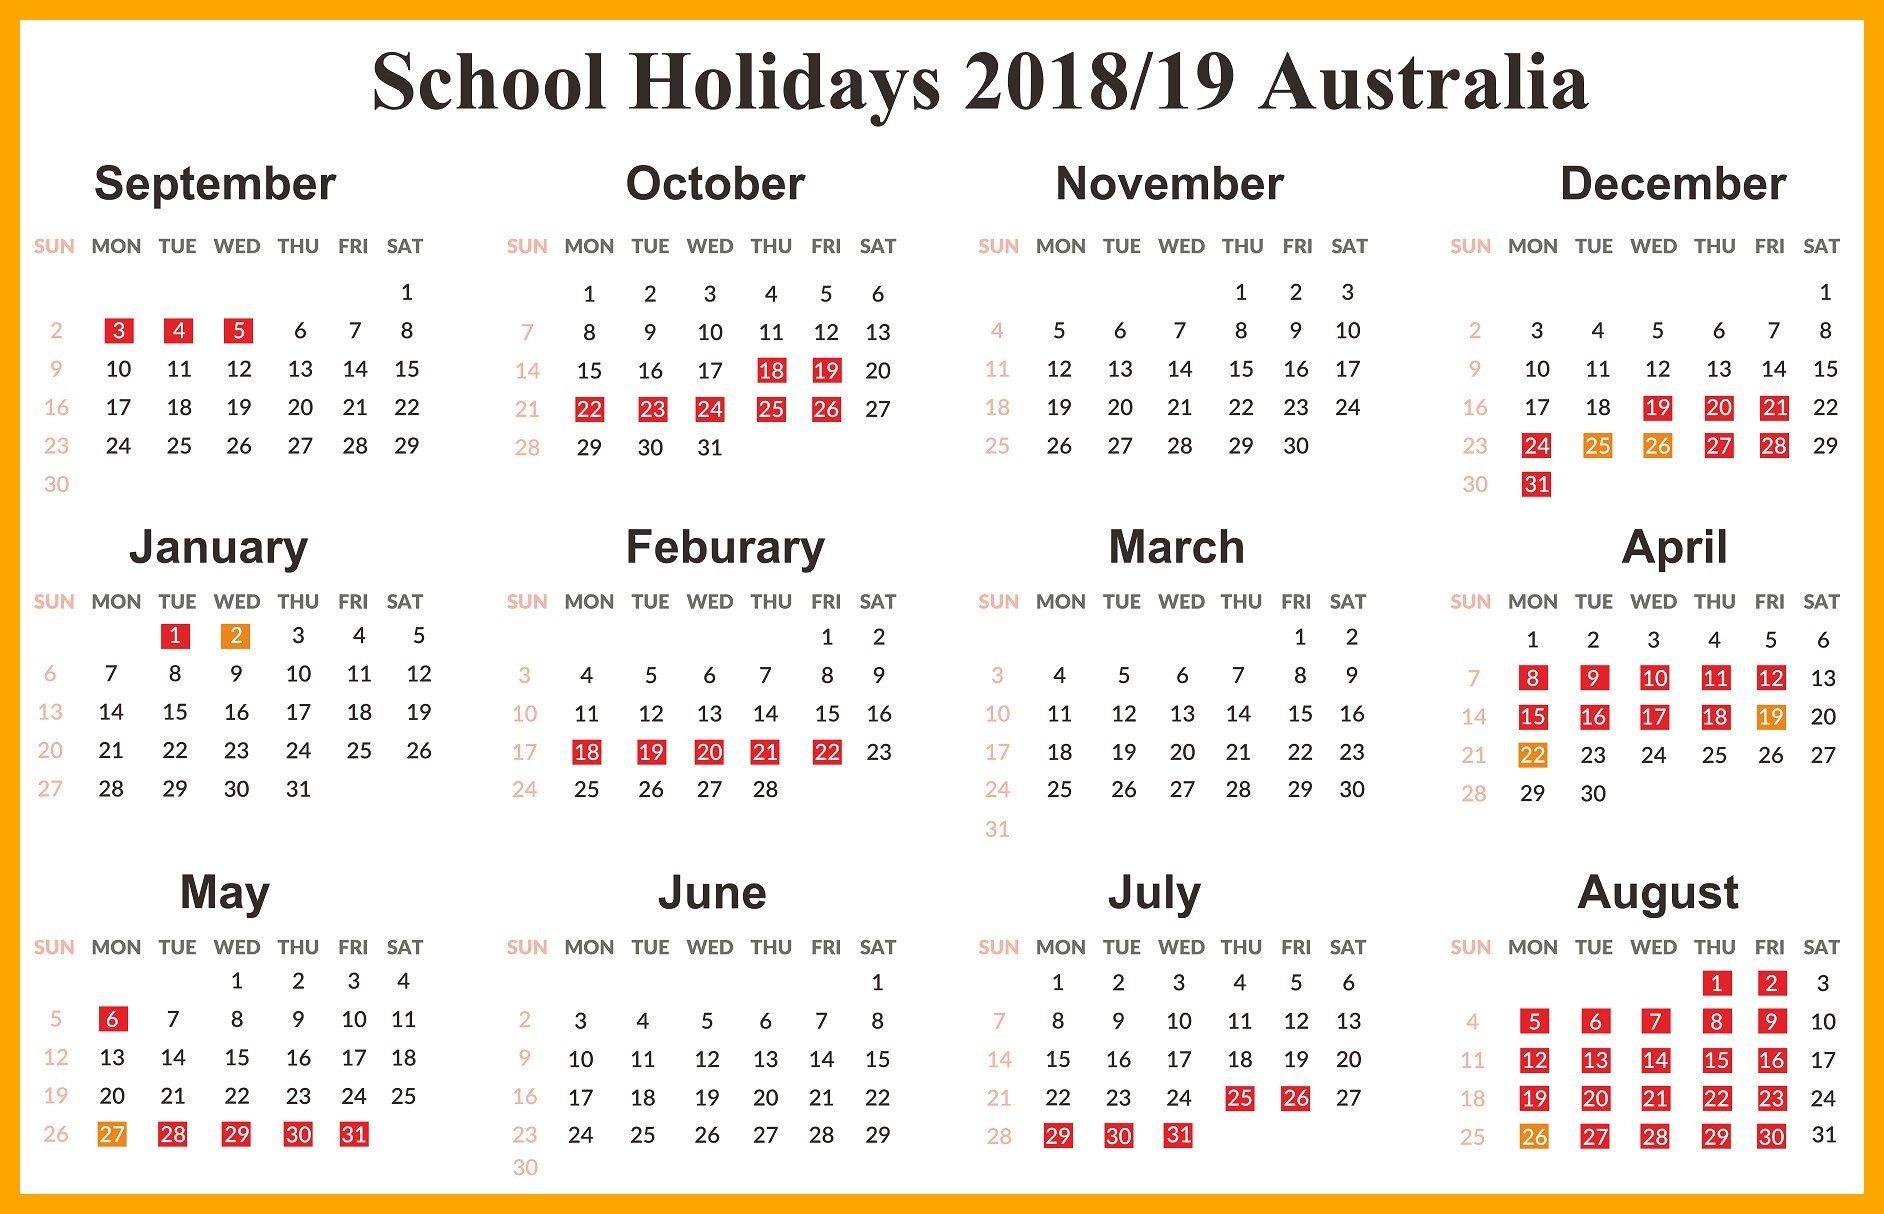 Australia 2019 School Holidays Calendar | 2019 Calendars | School S A School Calendar 2019